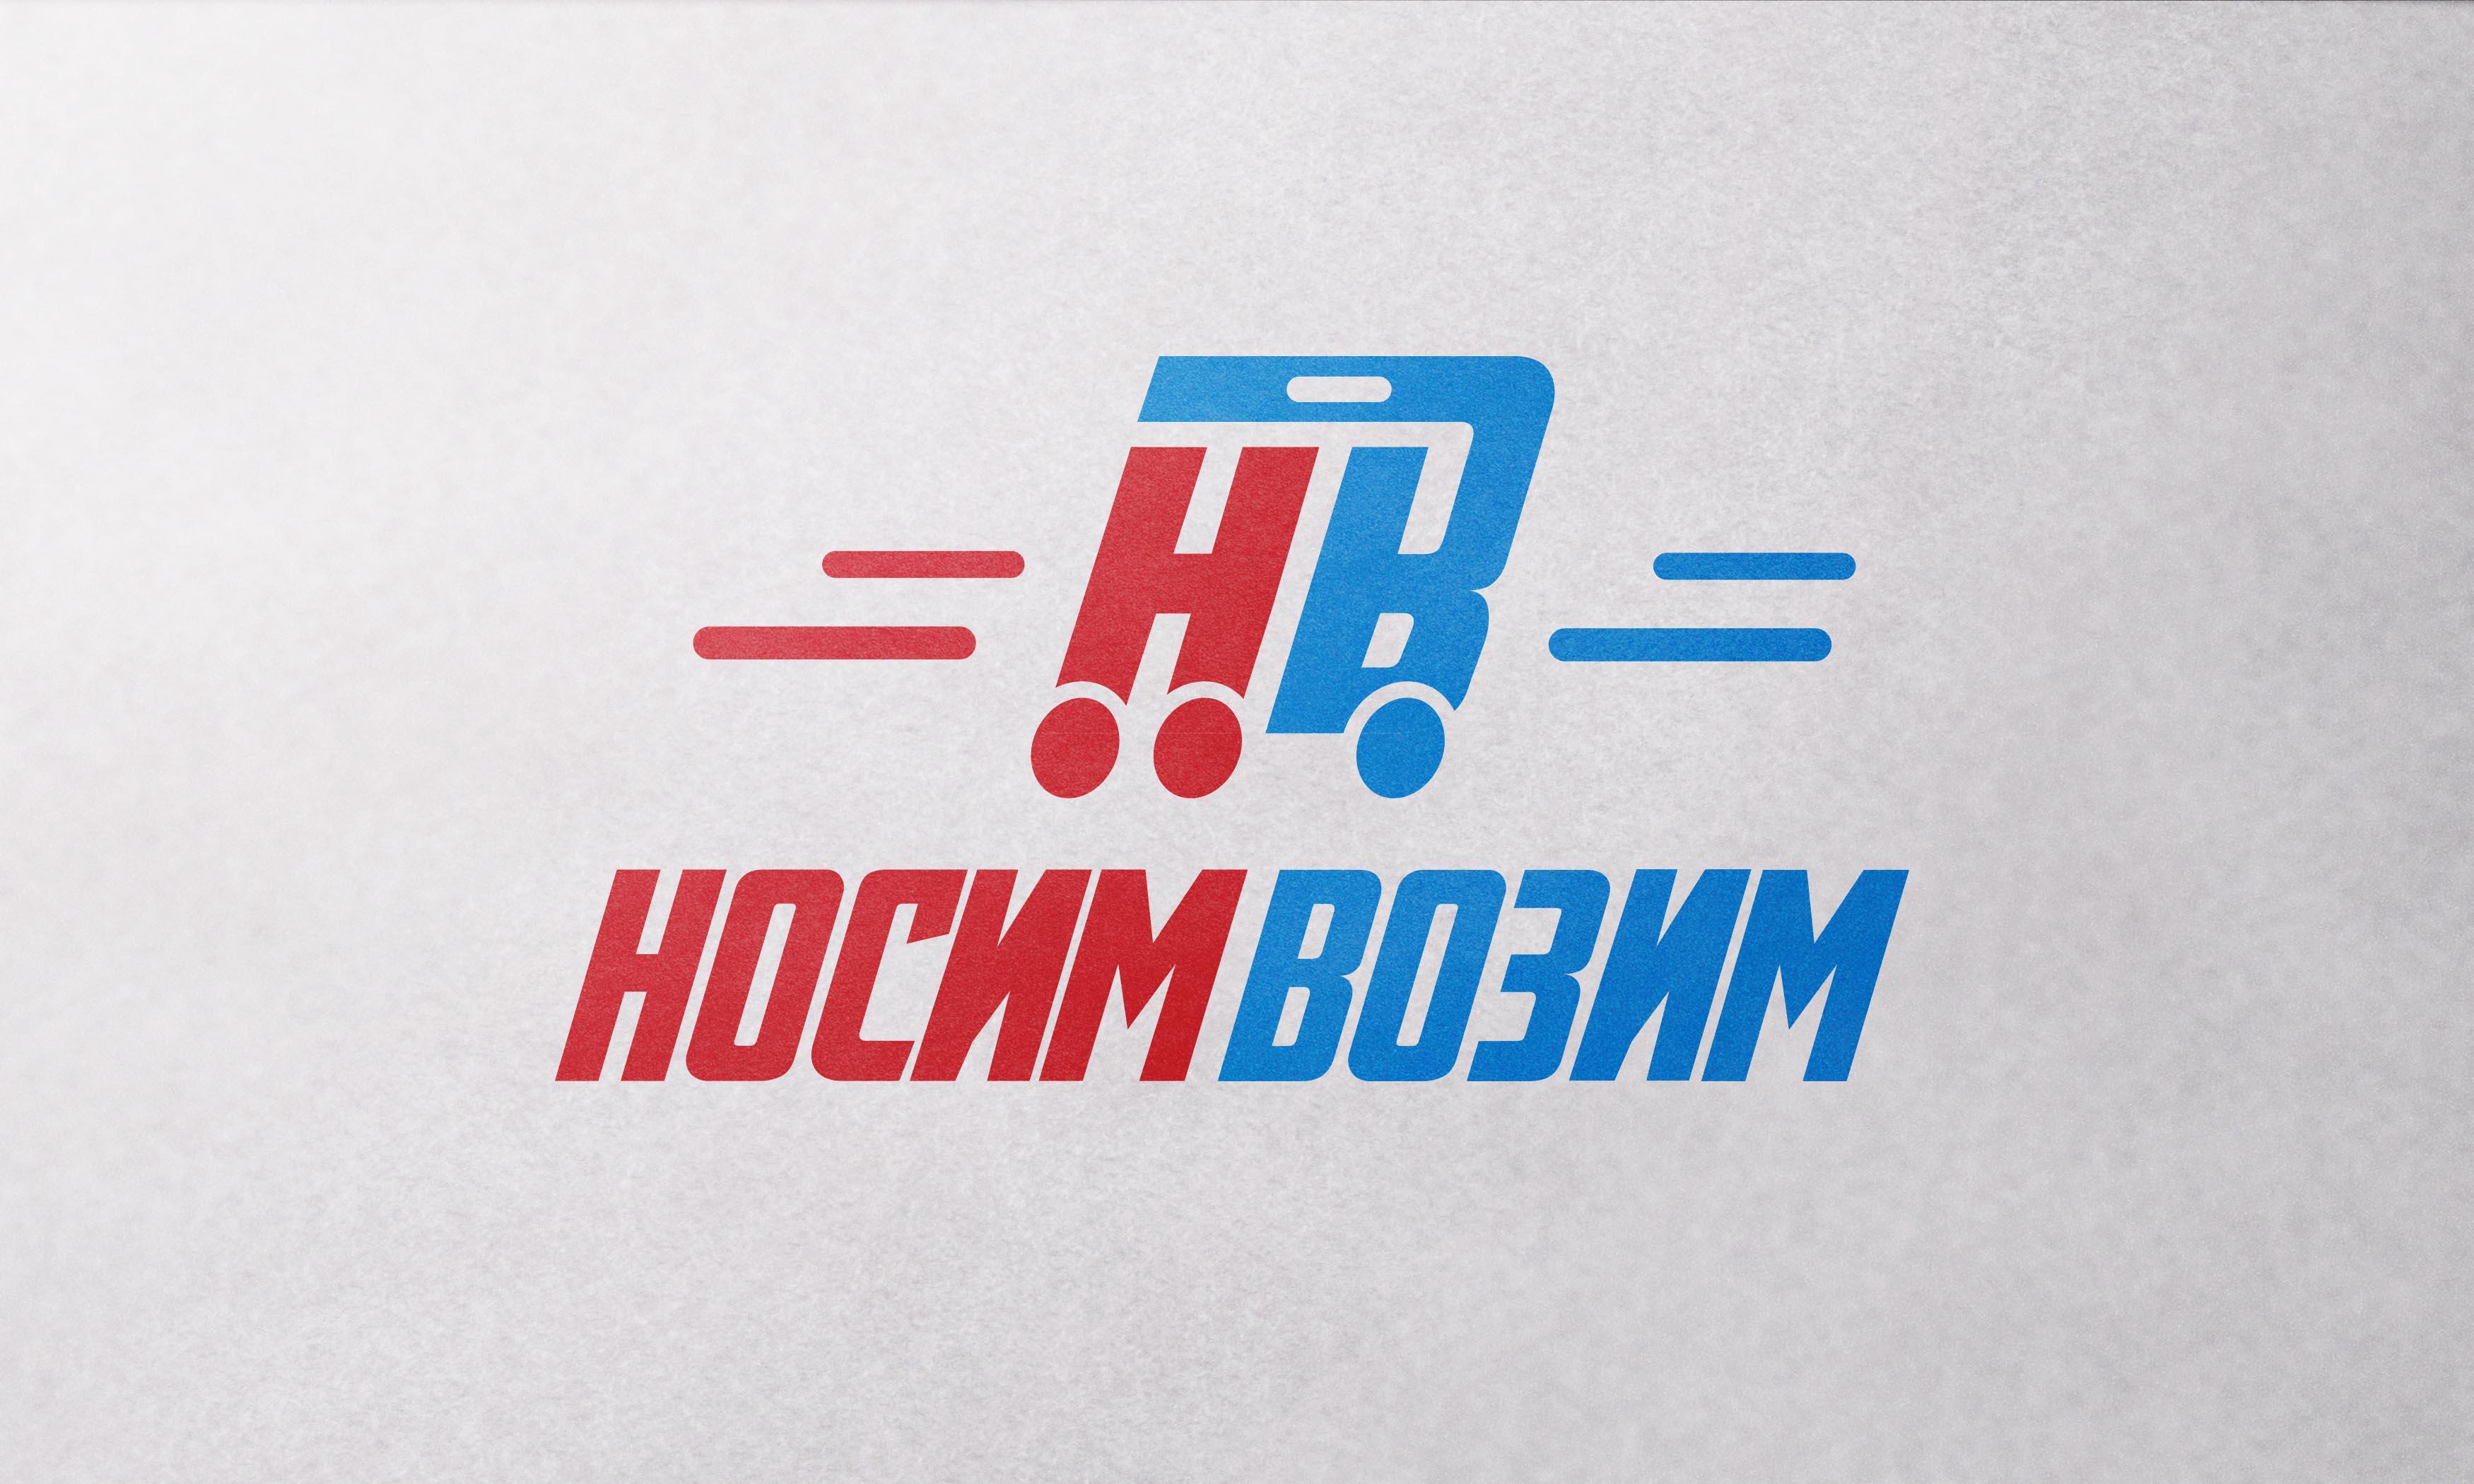 Логотип компании по перевозкам НосимВозим фото f_2775cfa171c5c1eb.jpg